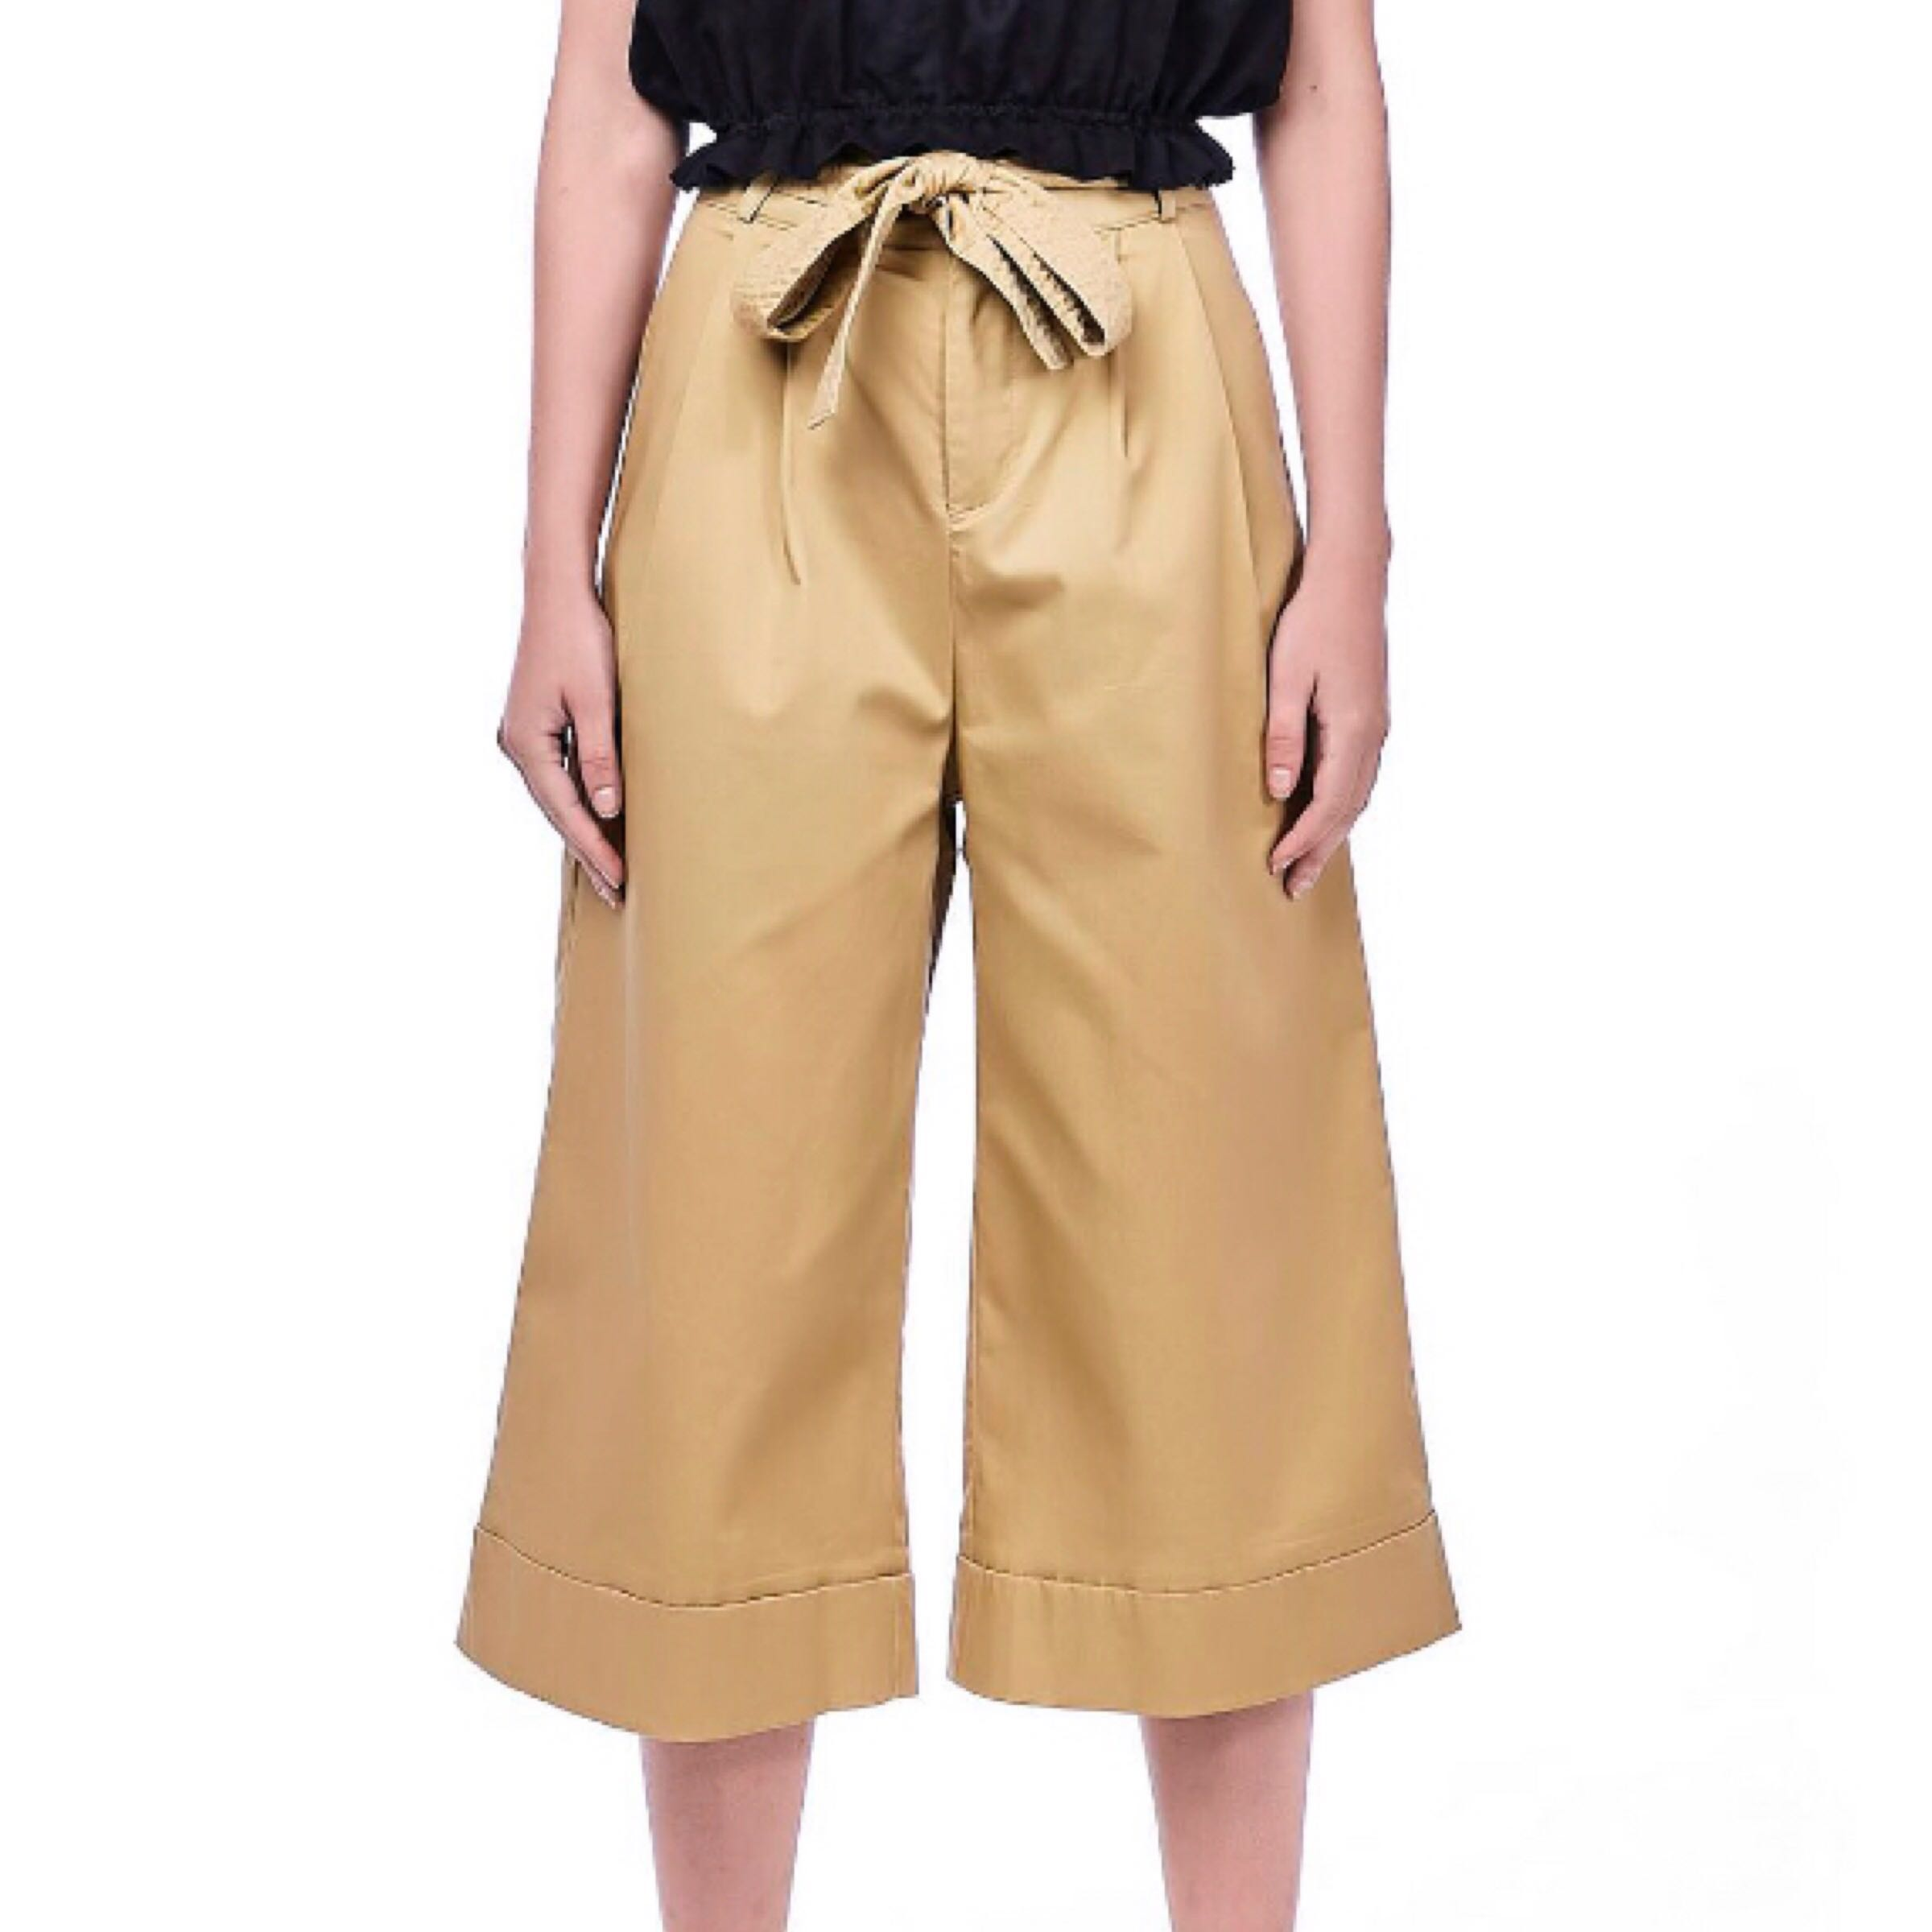 1ceb9e0325 The Editors Market Duscha Wide Leg Pants in Camel, Women's Fashion ...